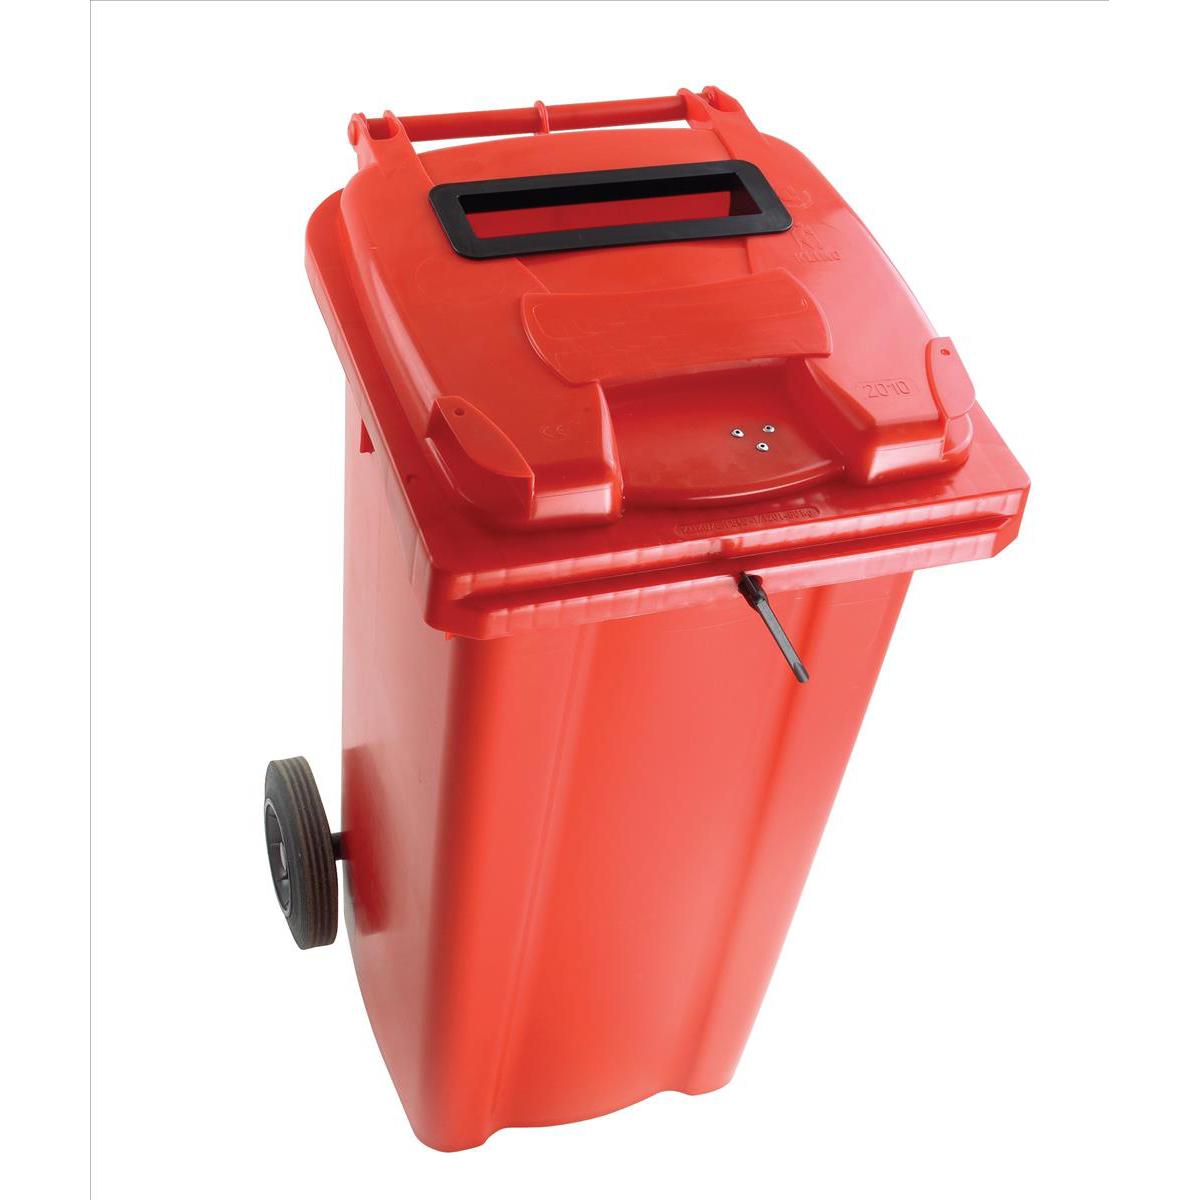 Wheeled Bin UV Stabilised Polyethylene with Rear Wheels Lid Lock 120 Litre Capacity 480x555x930mm Red